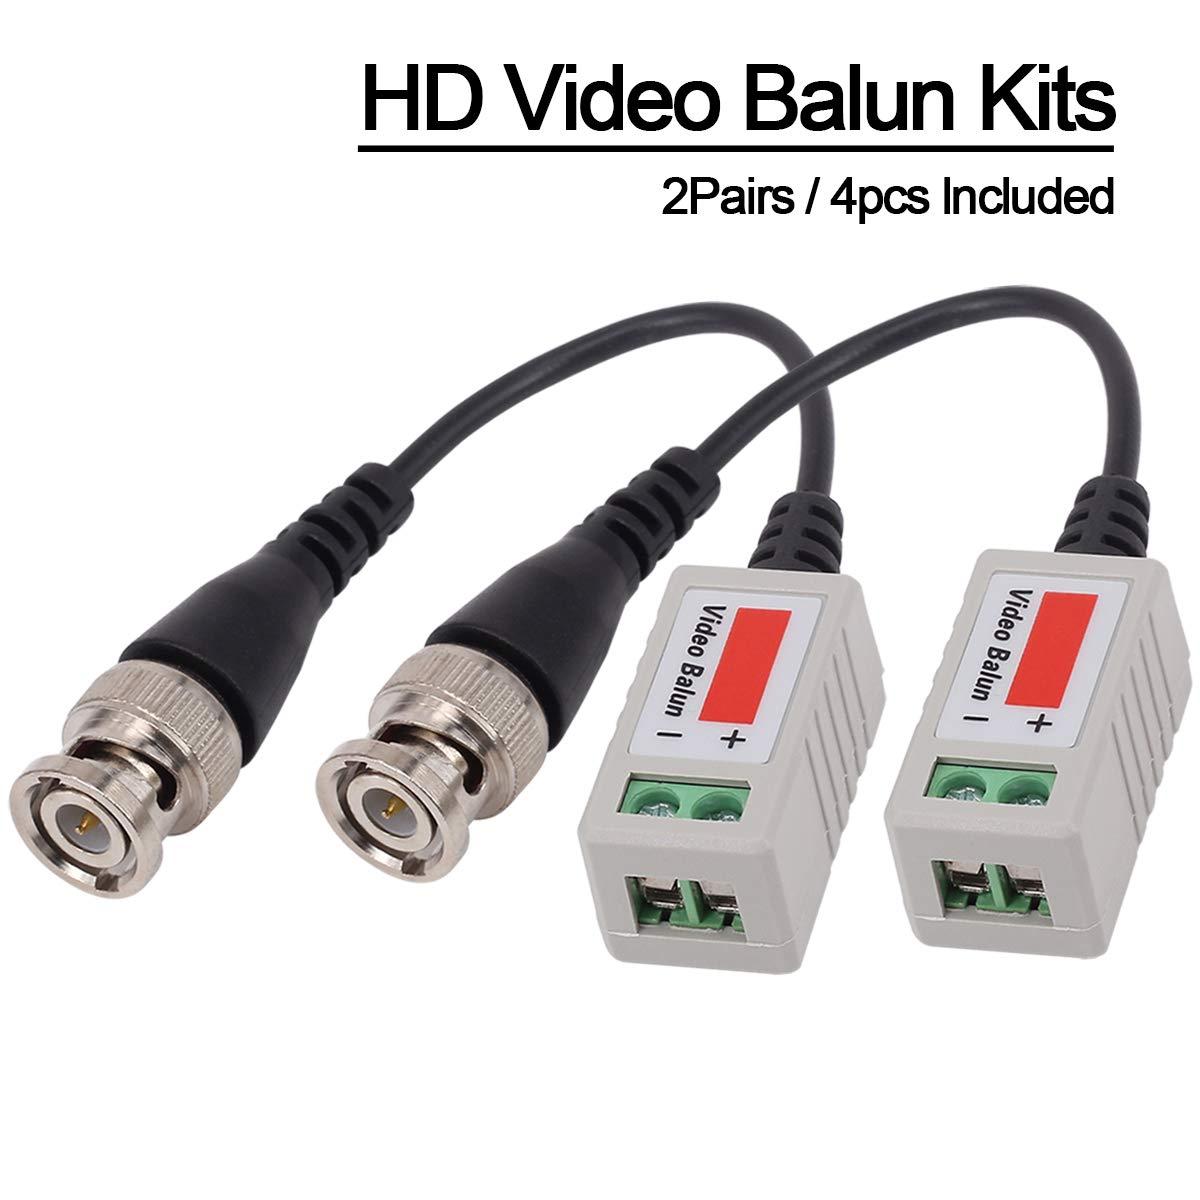 Mini C/ámara CCTV BNC CAT5 Video Balun Cable Transceptor Yilan 2 pares 4 unidades